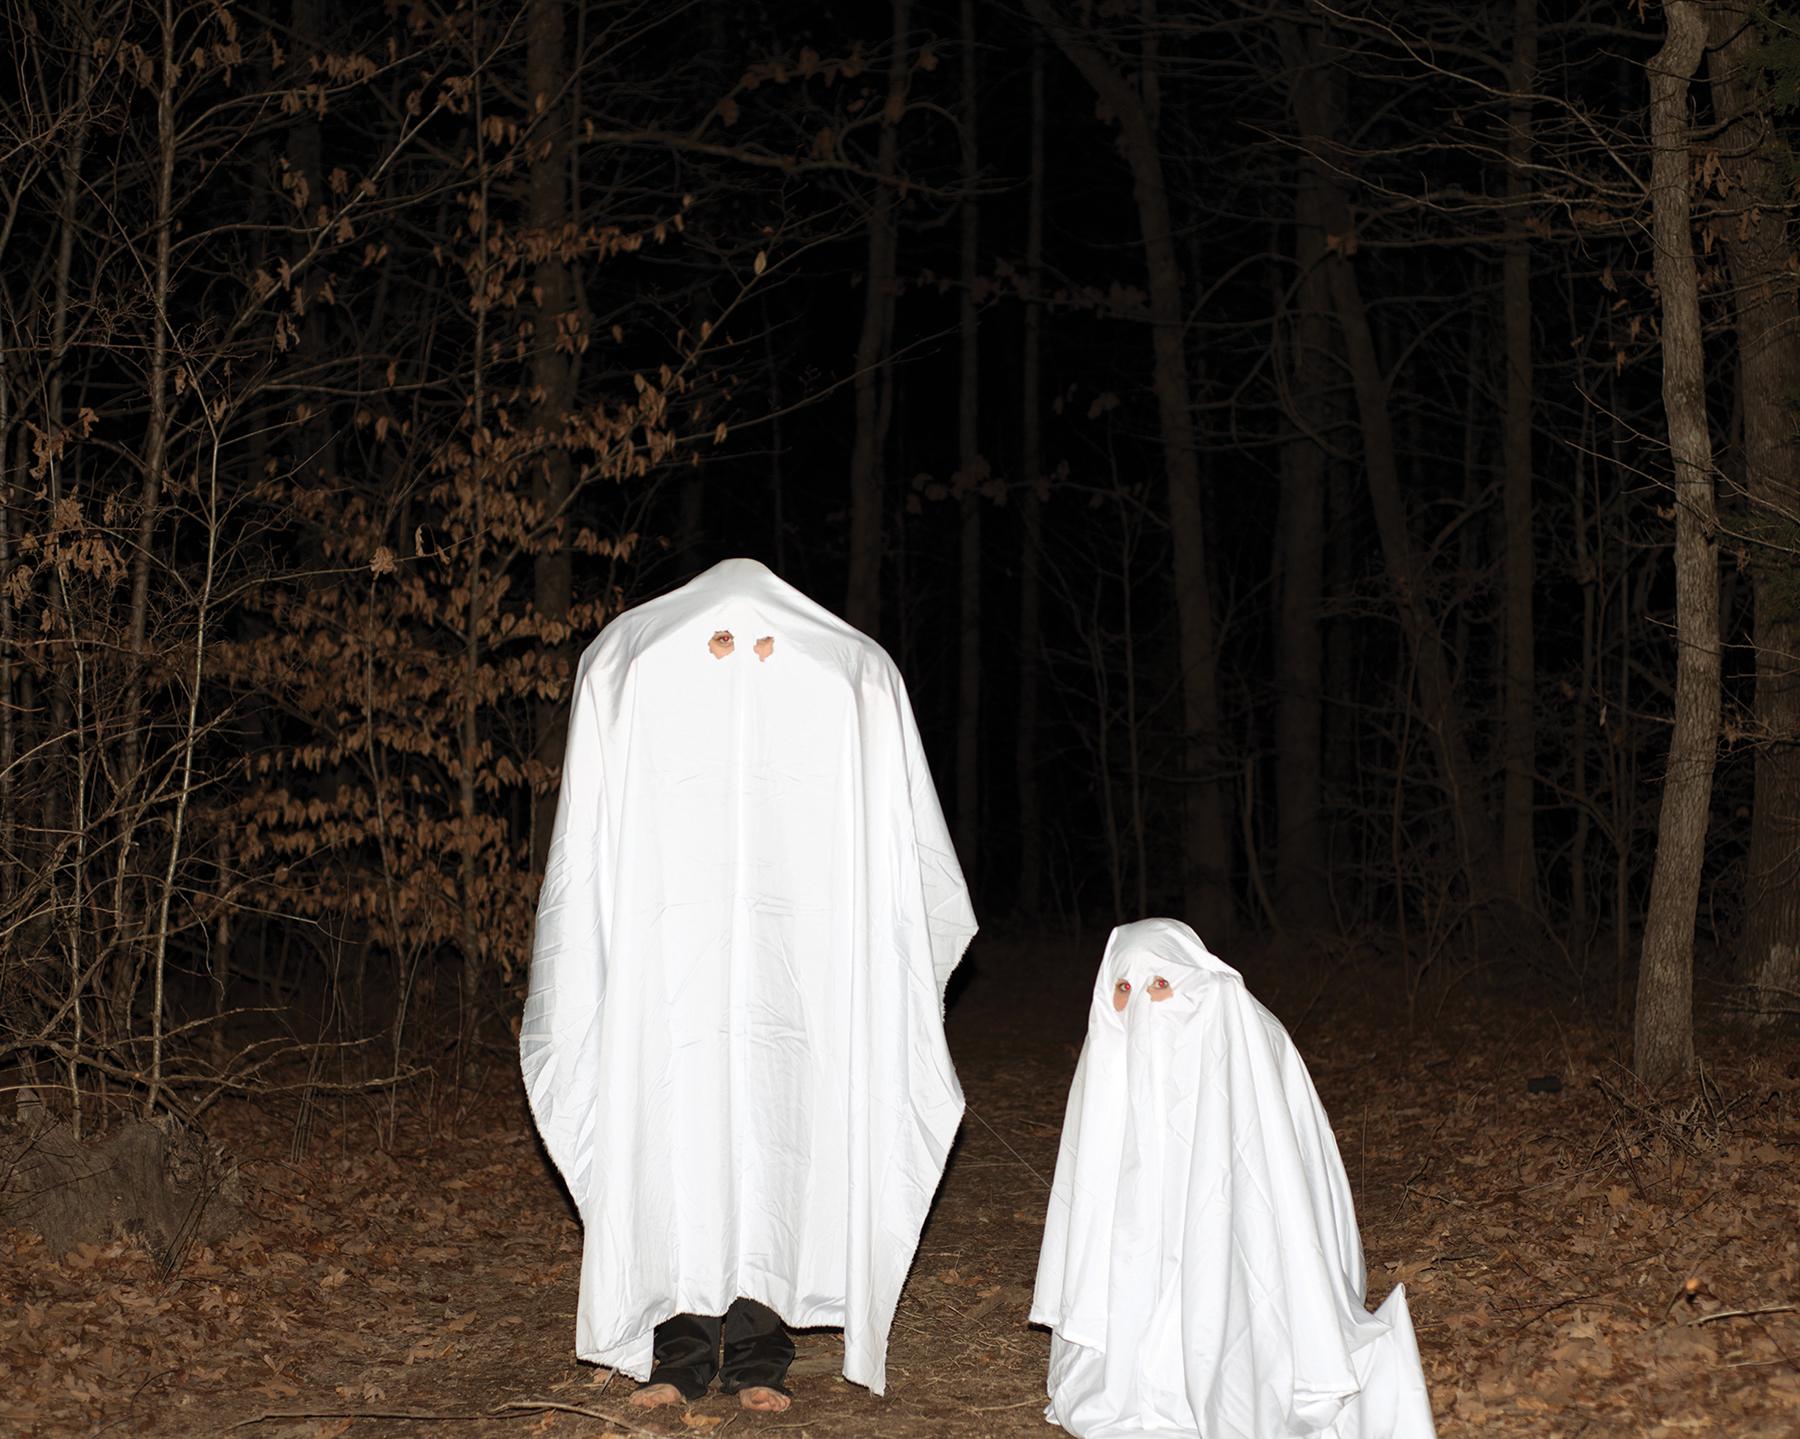 1551205422427-ElizabethMoran_RecordofCherryRoad_Halloween_300